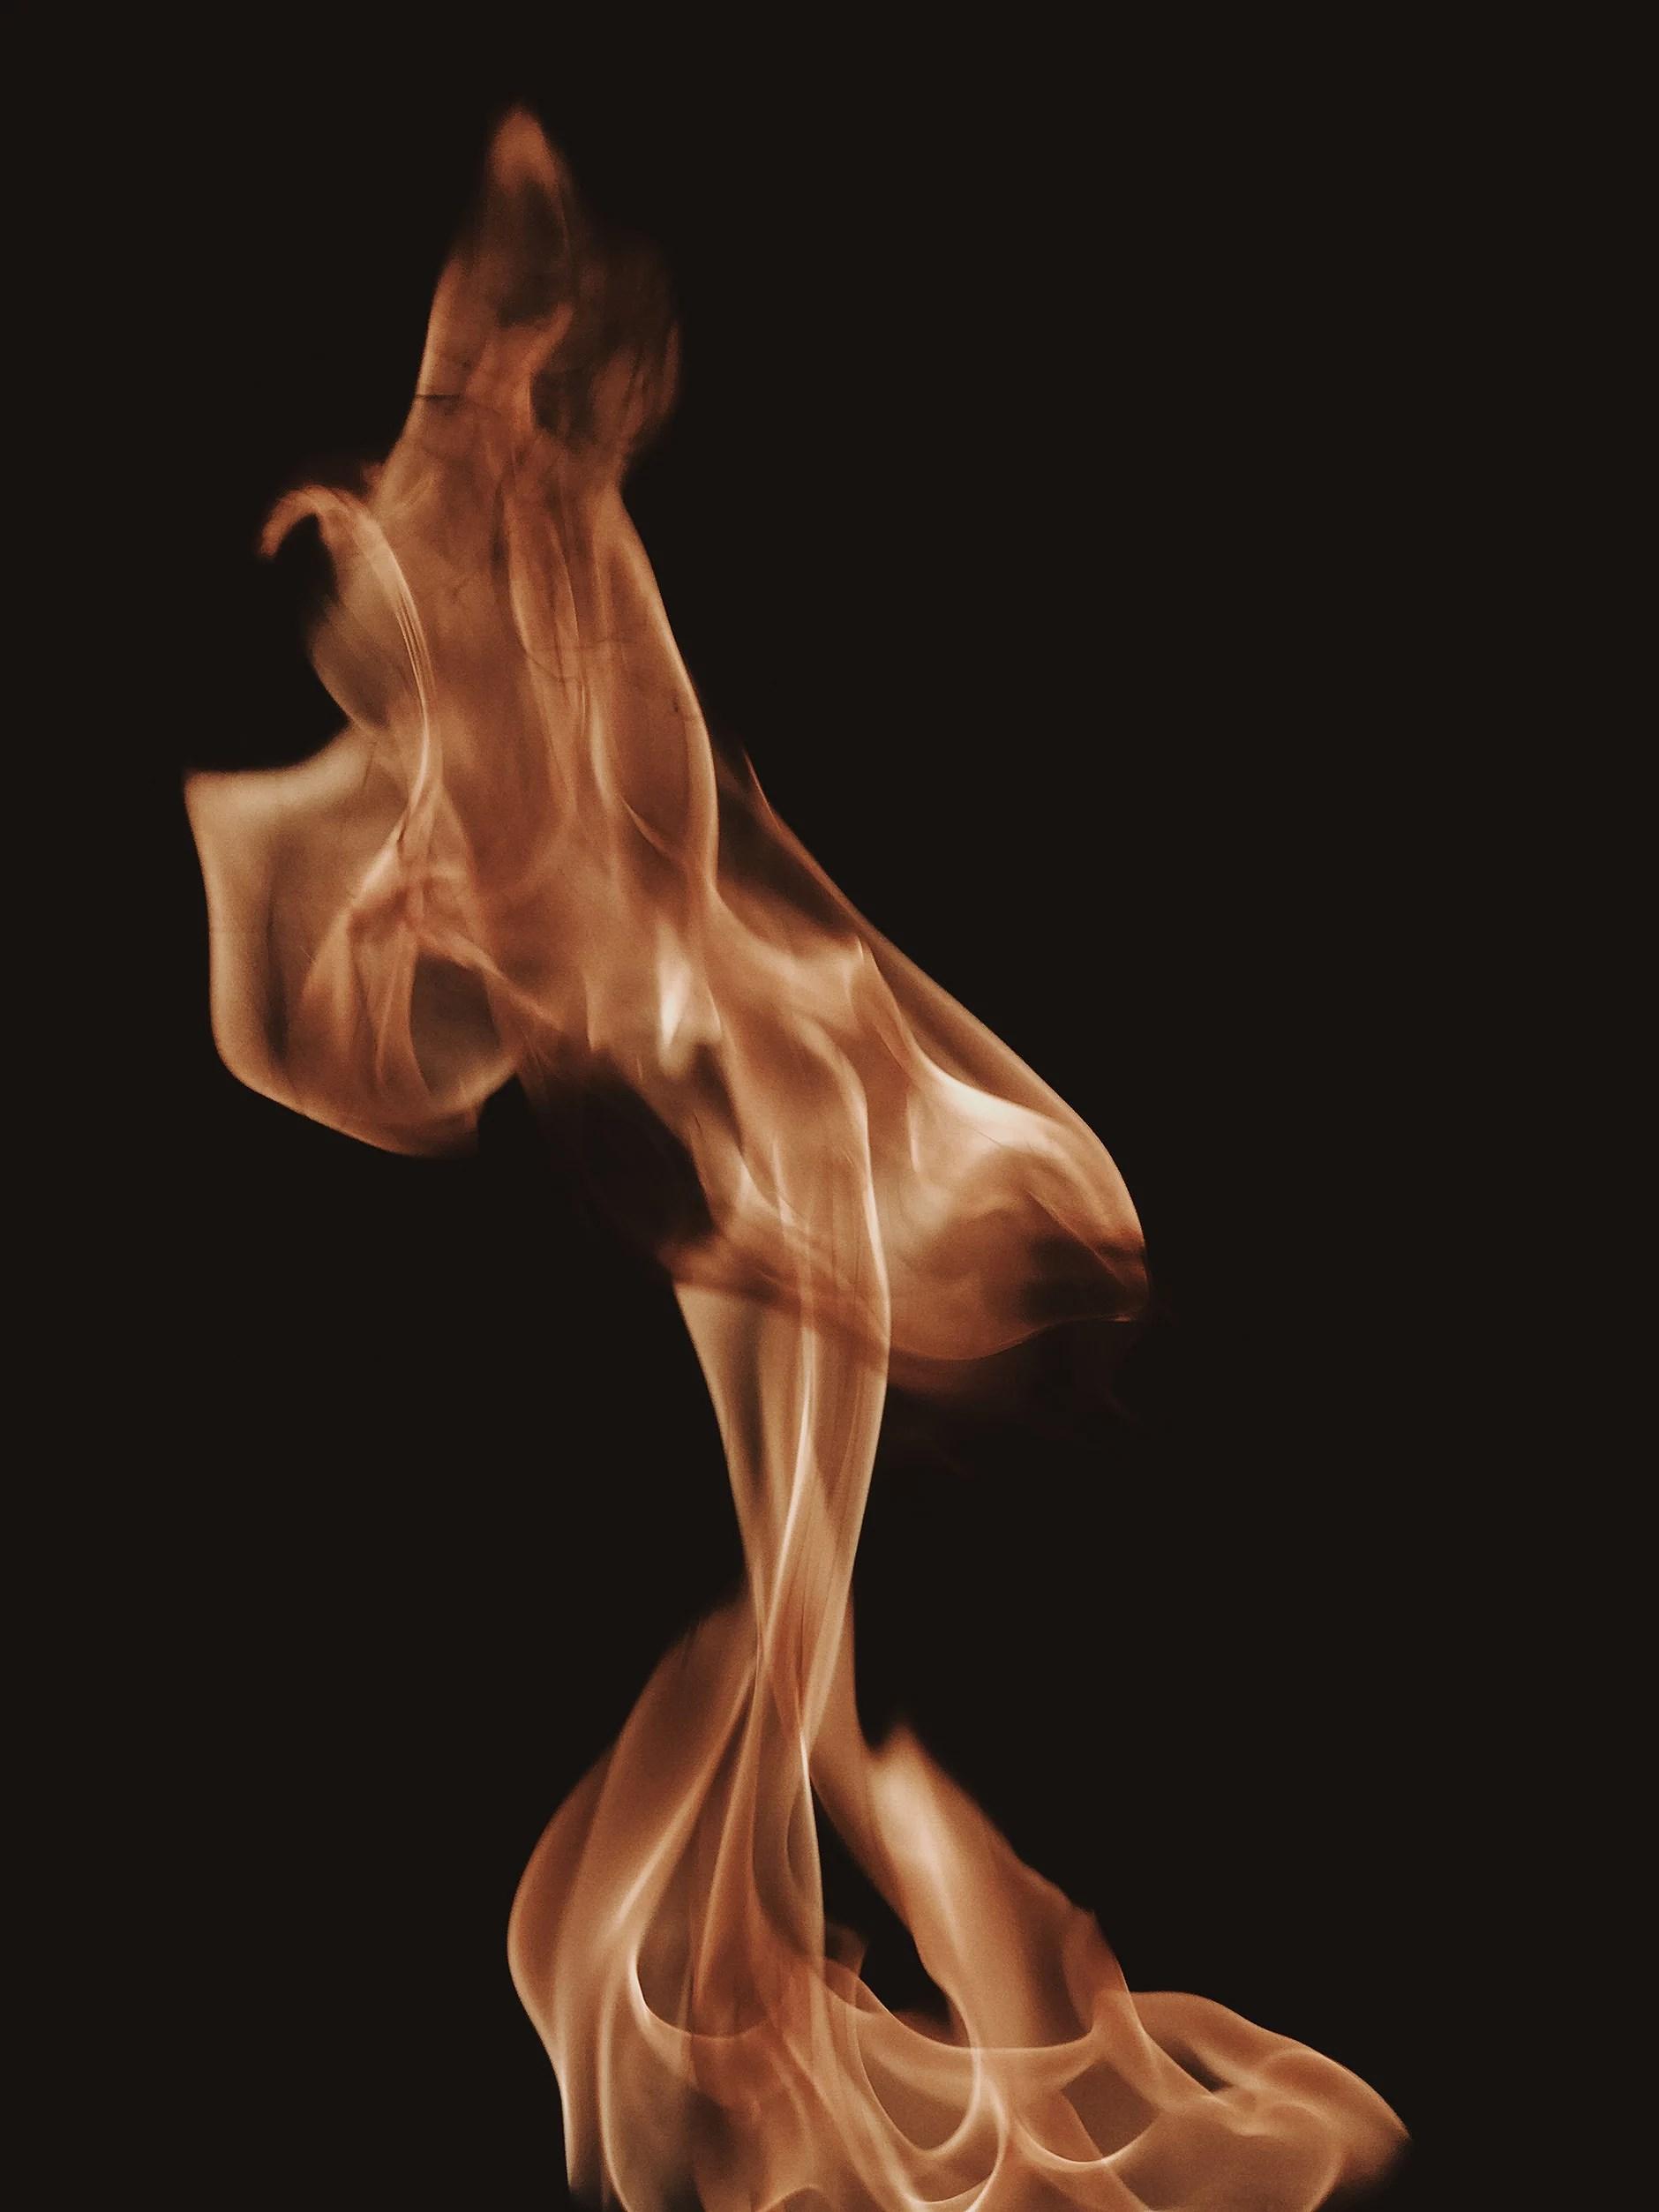 My inner flame